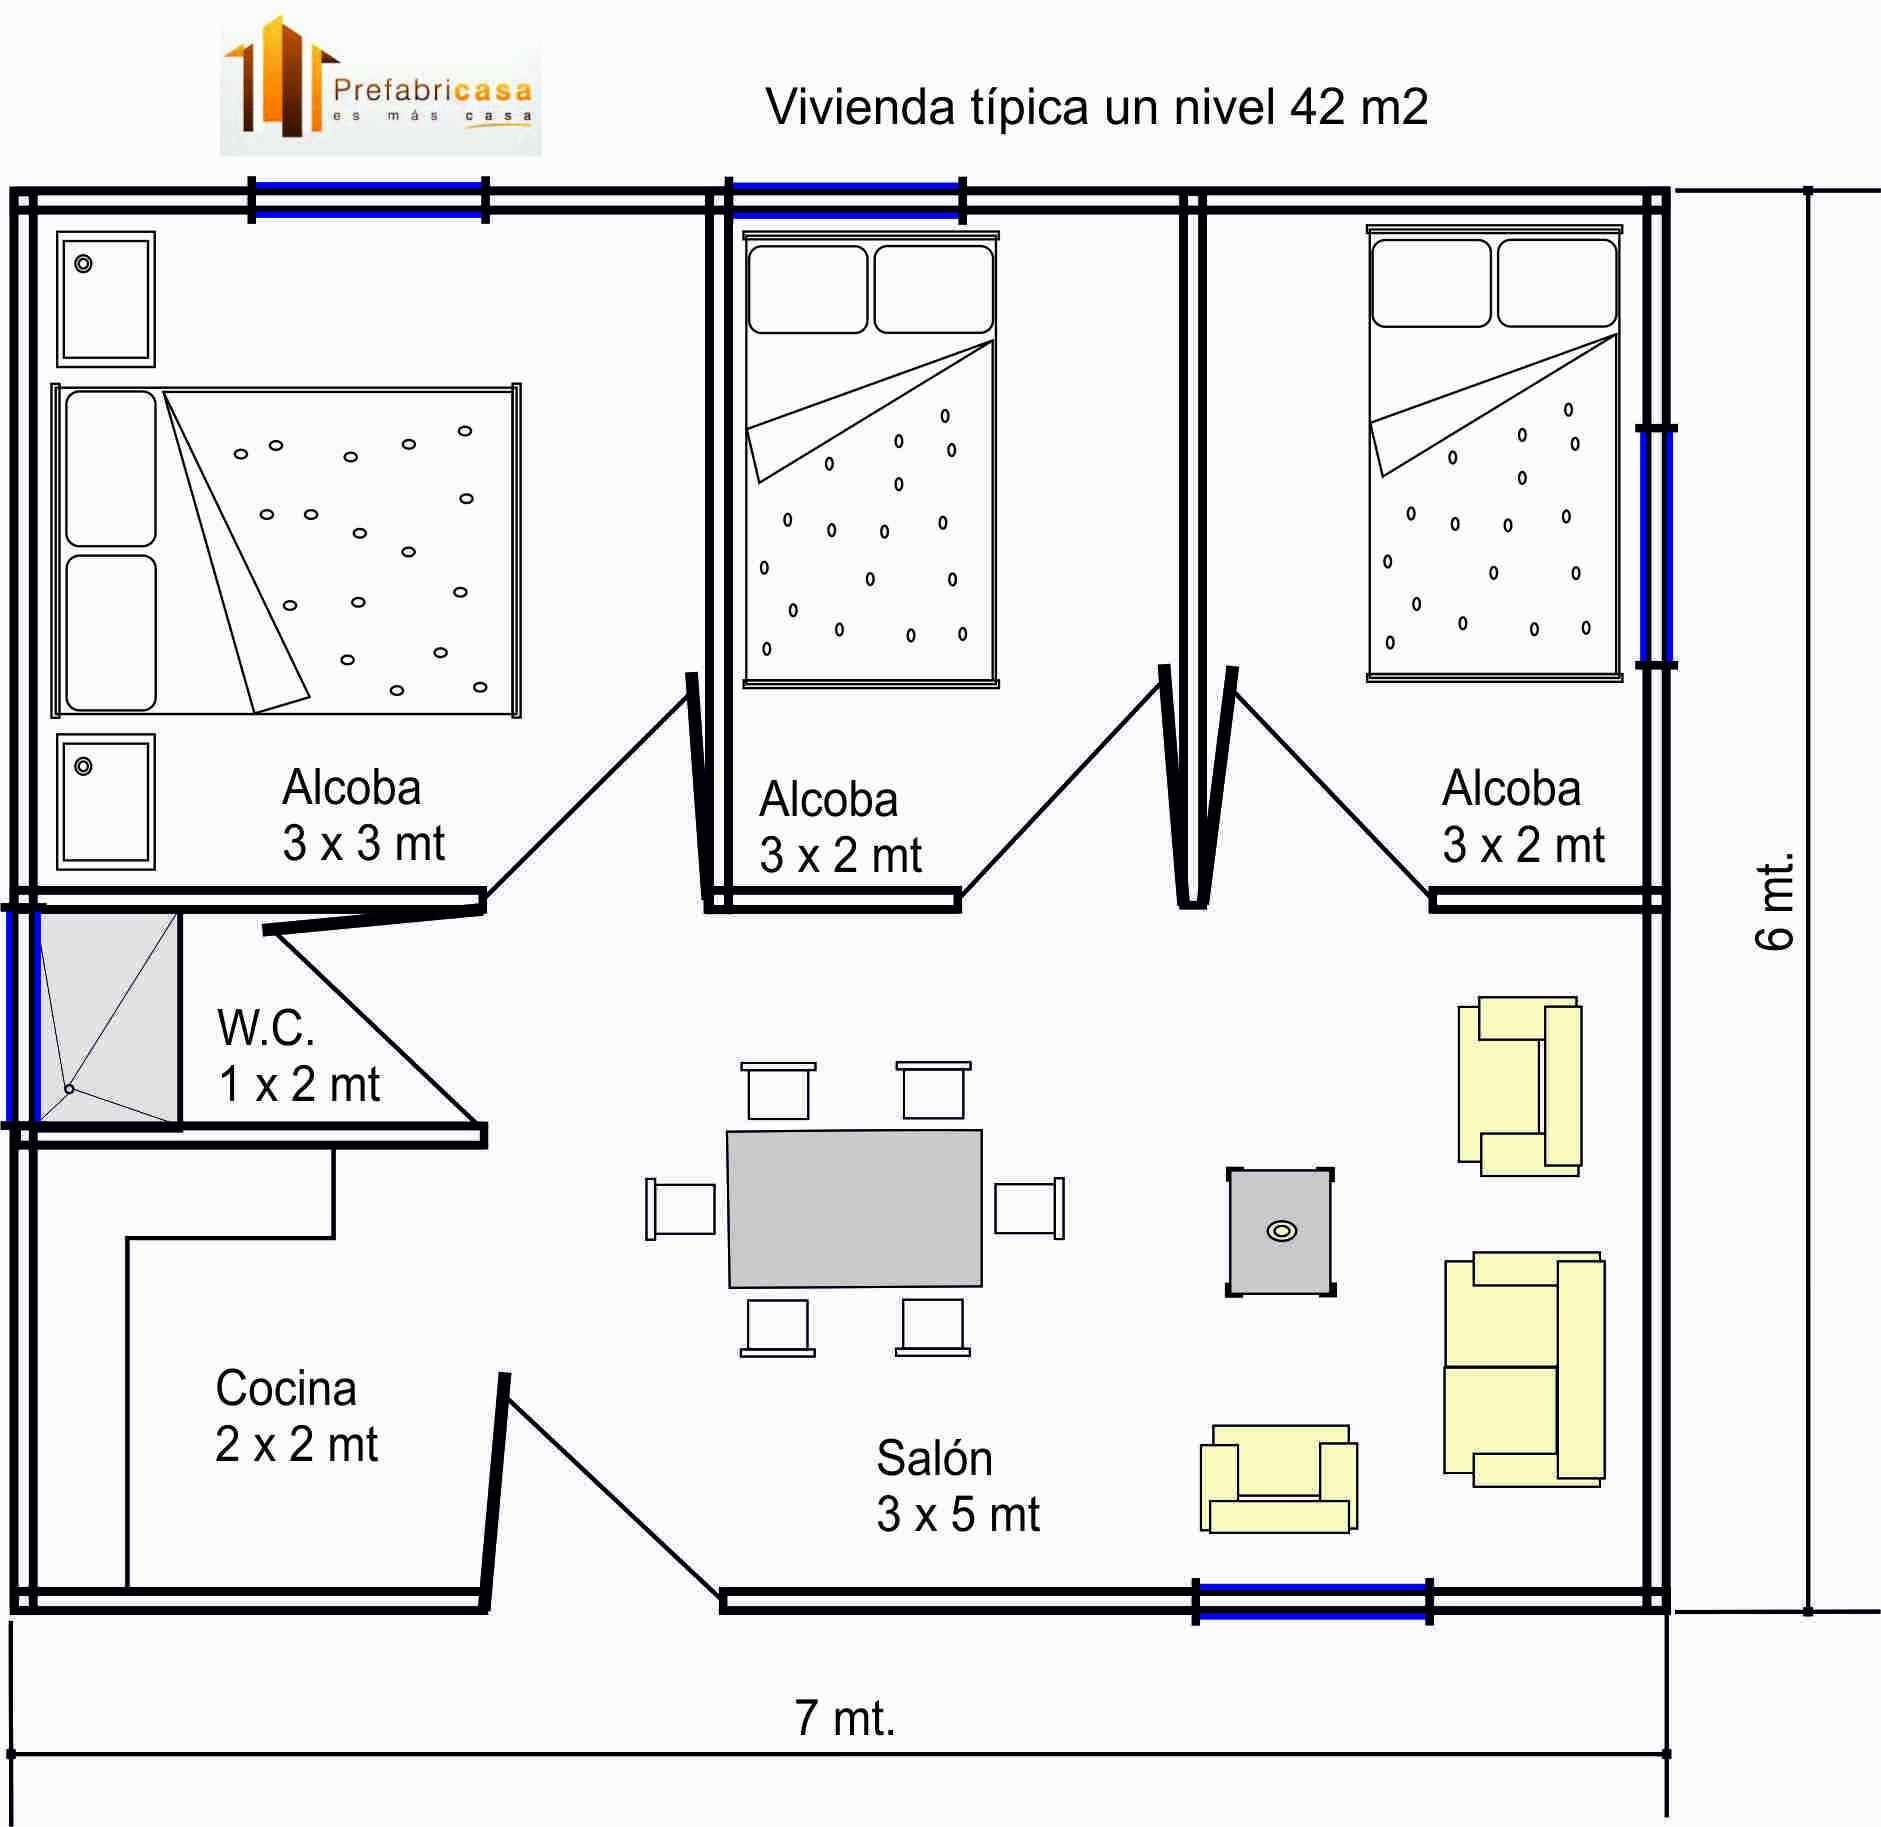 Casas prefabricadas 42 mts 2 casas prefabricadas for Disenos y planos de casas prefabricadas